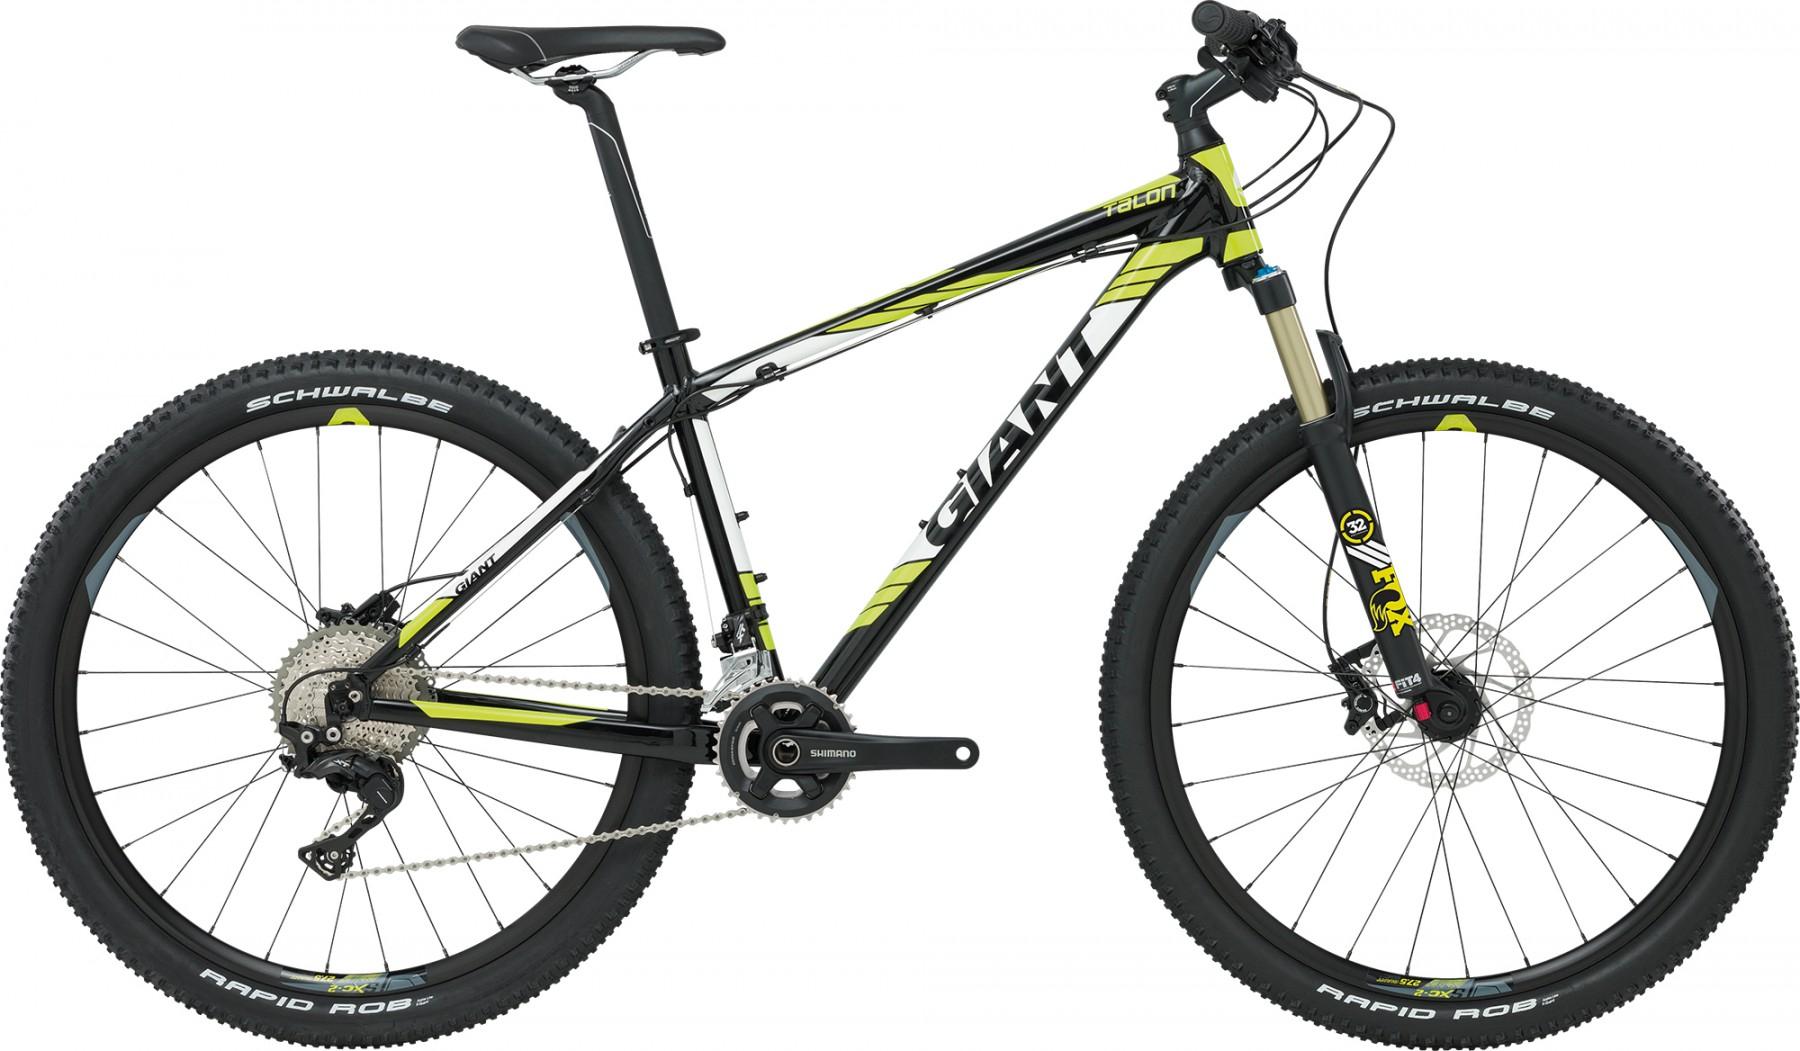 Giant Talon RC LTD - Hardtail Mountainbike mit guter Federgabel